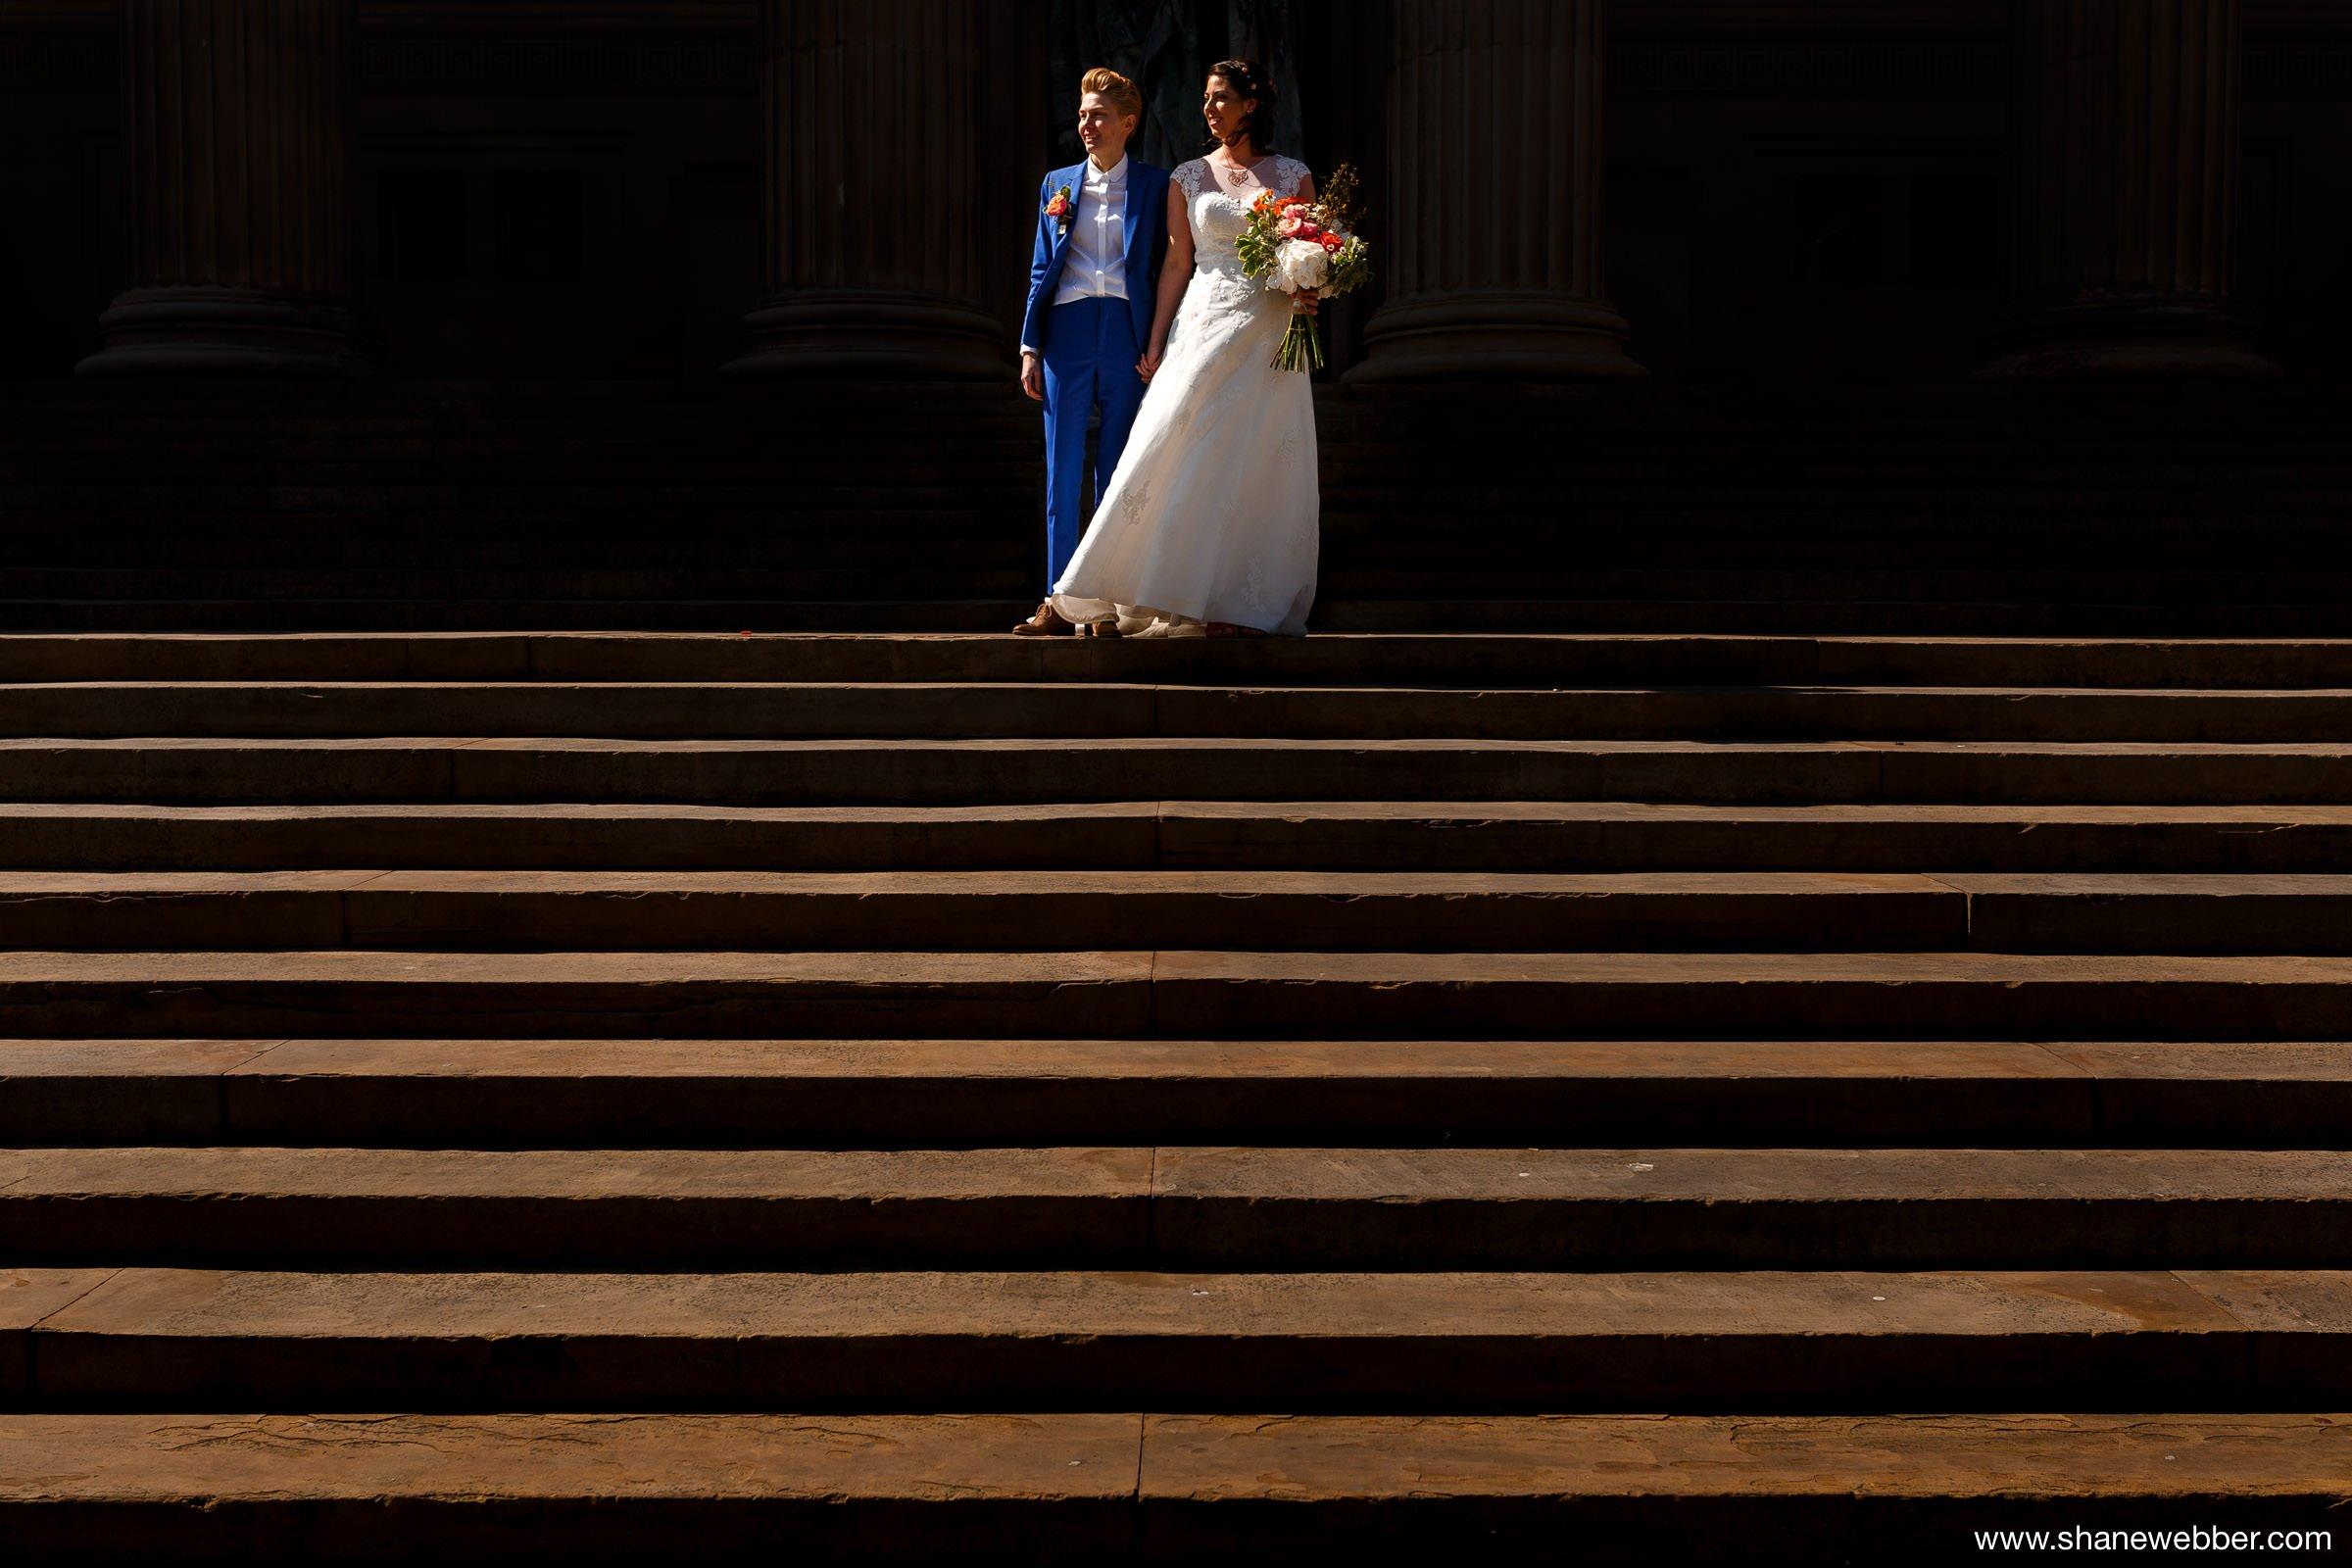 My favourite same sex wedding photo